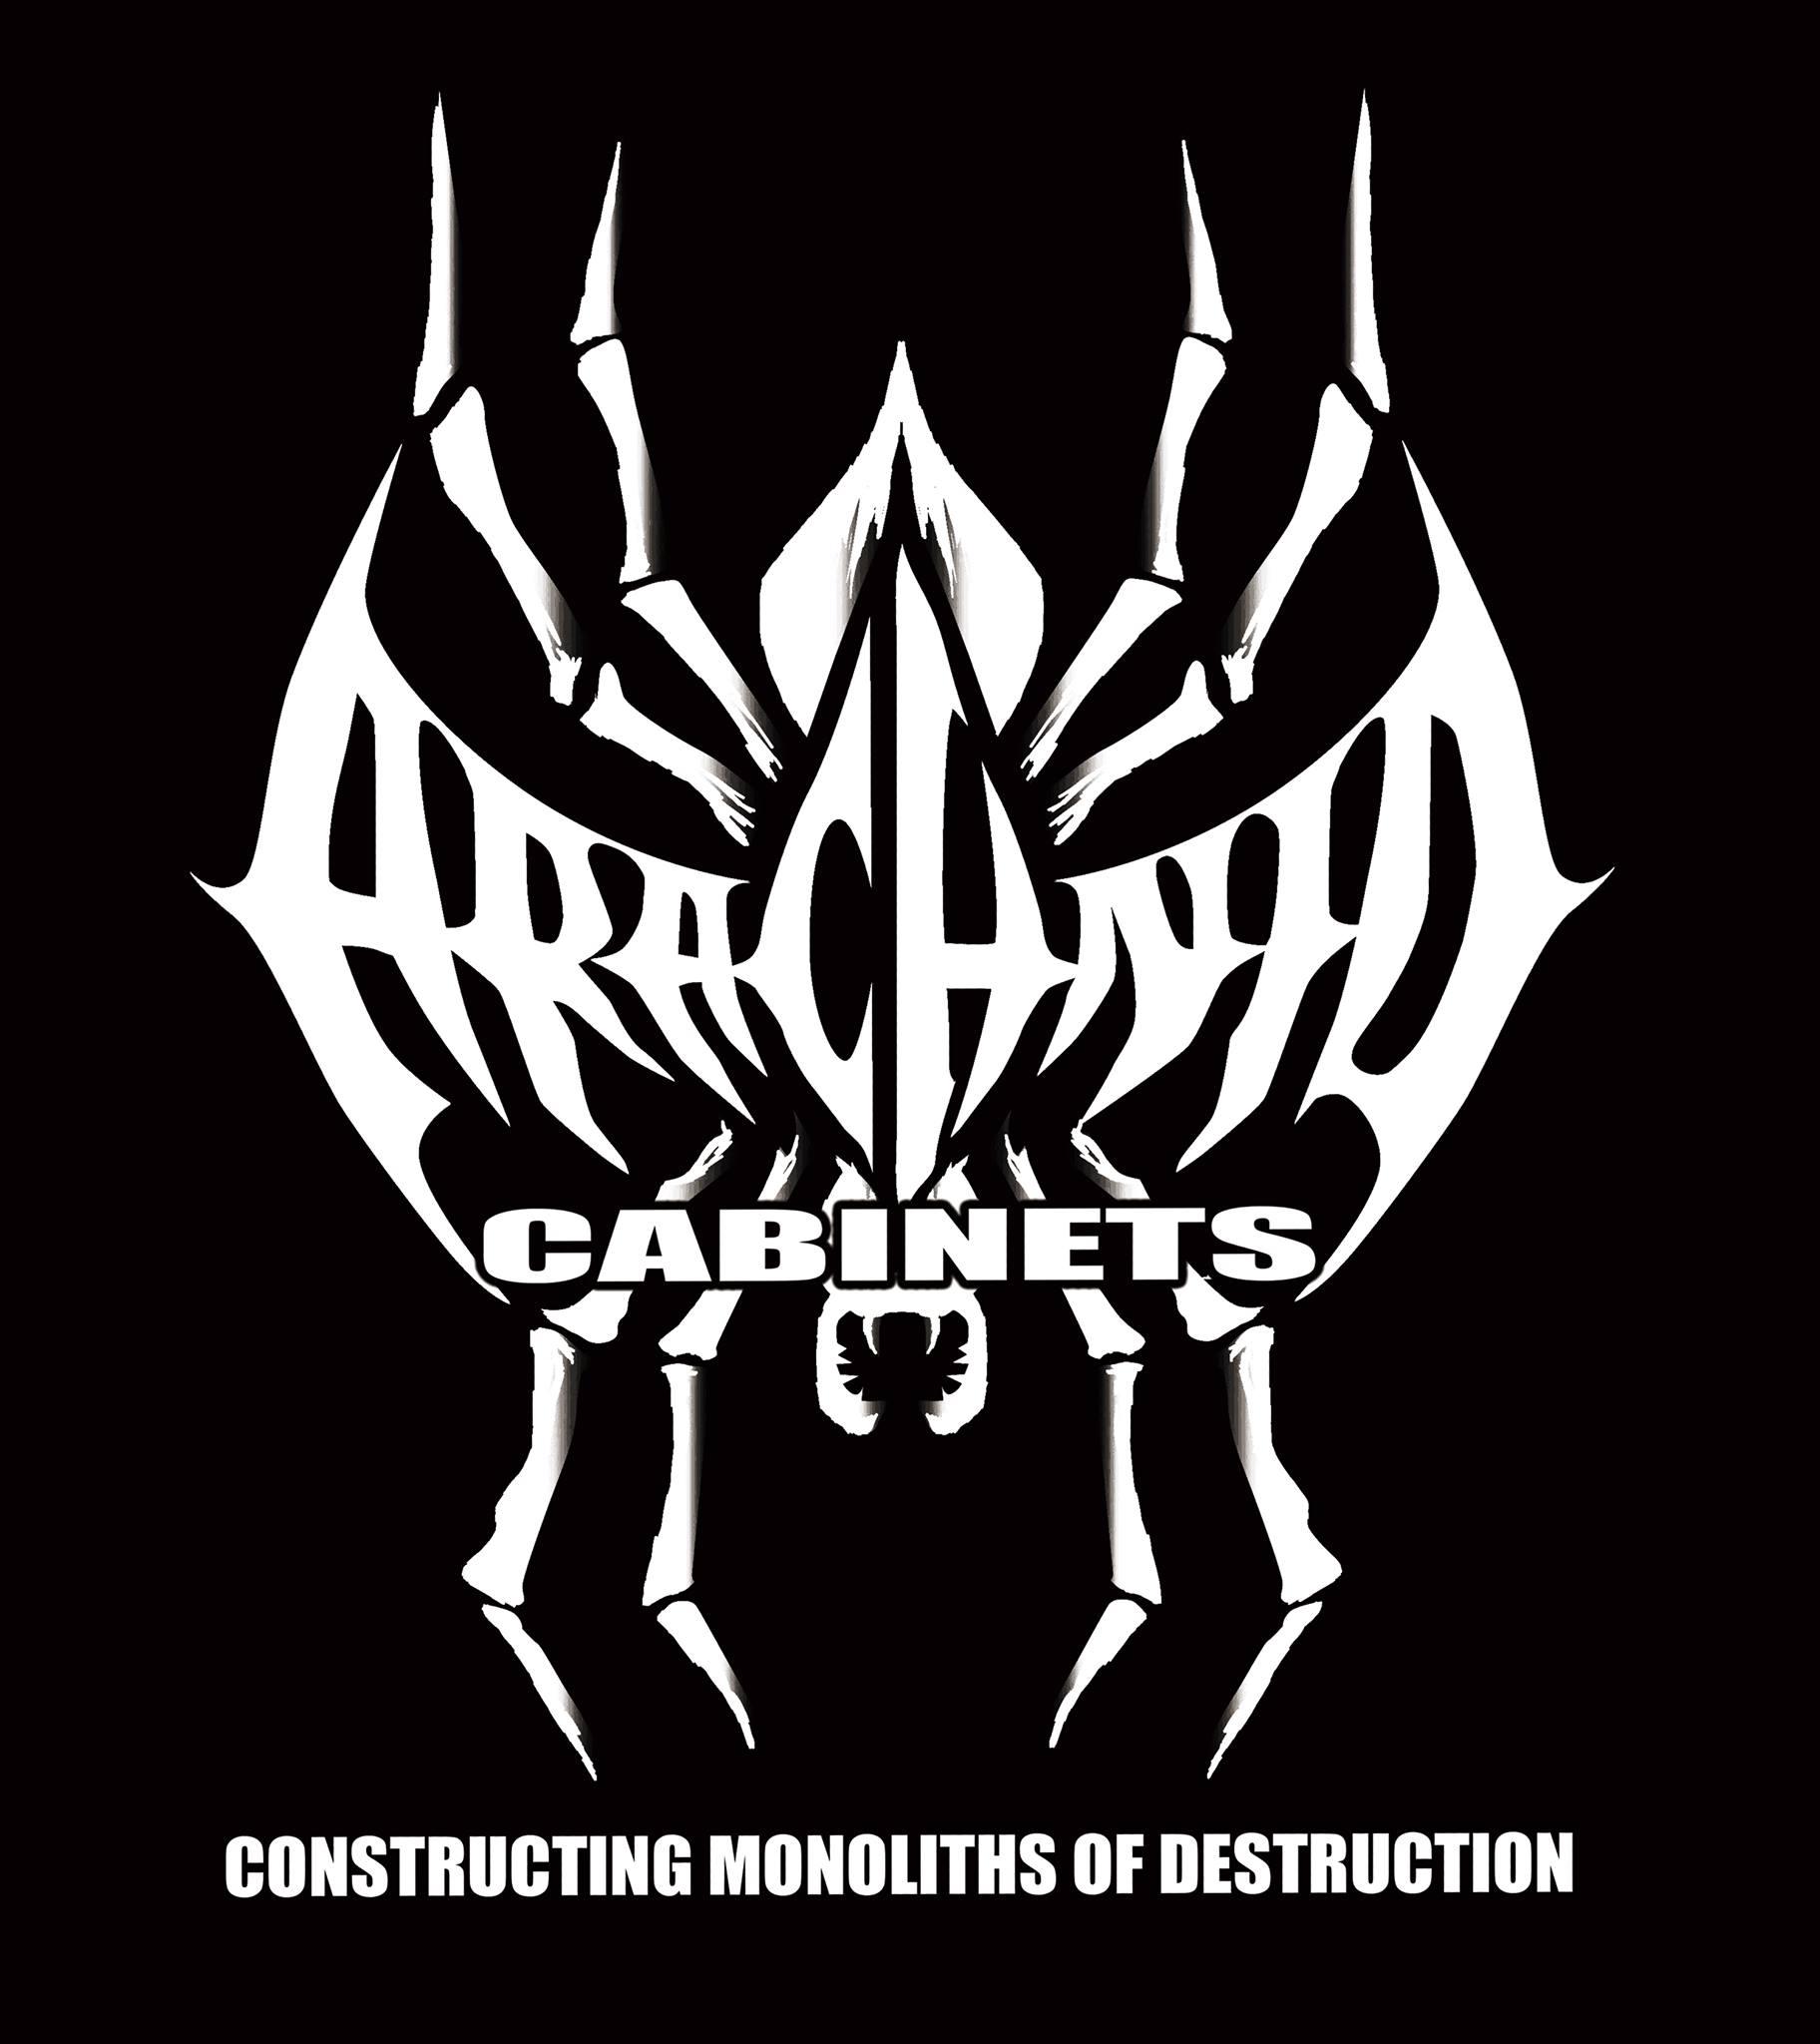 Arachnid Cabinets